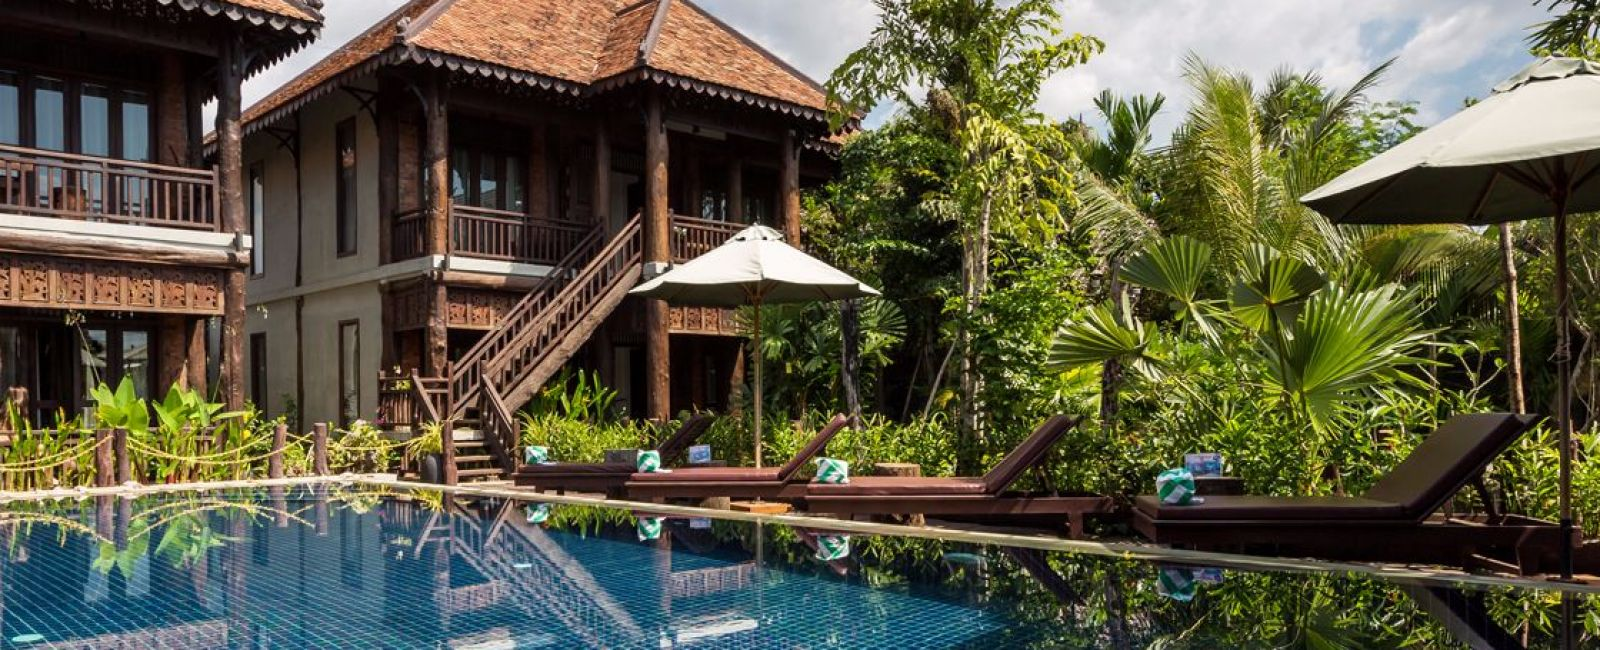 Welcome To Java Wooden Villa Residence Java Wooden Villa